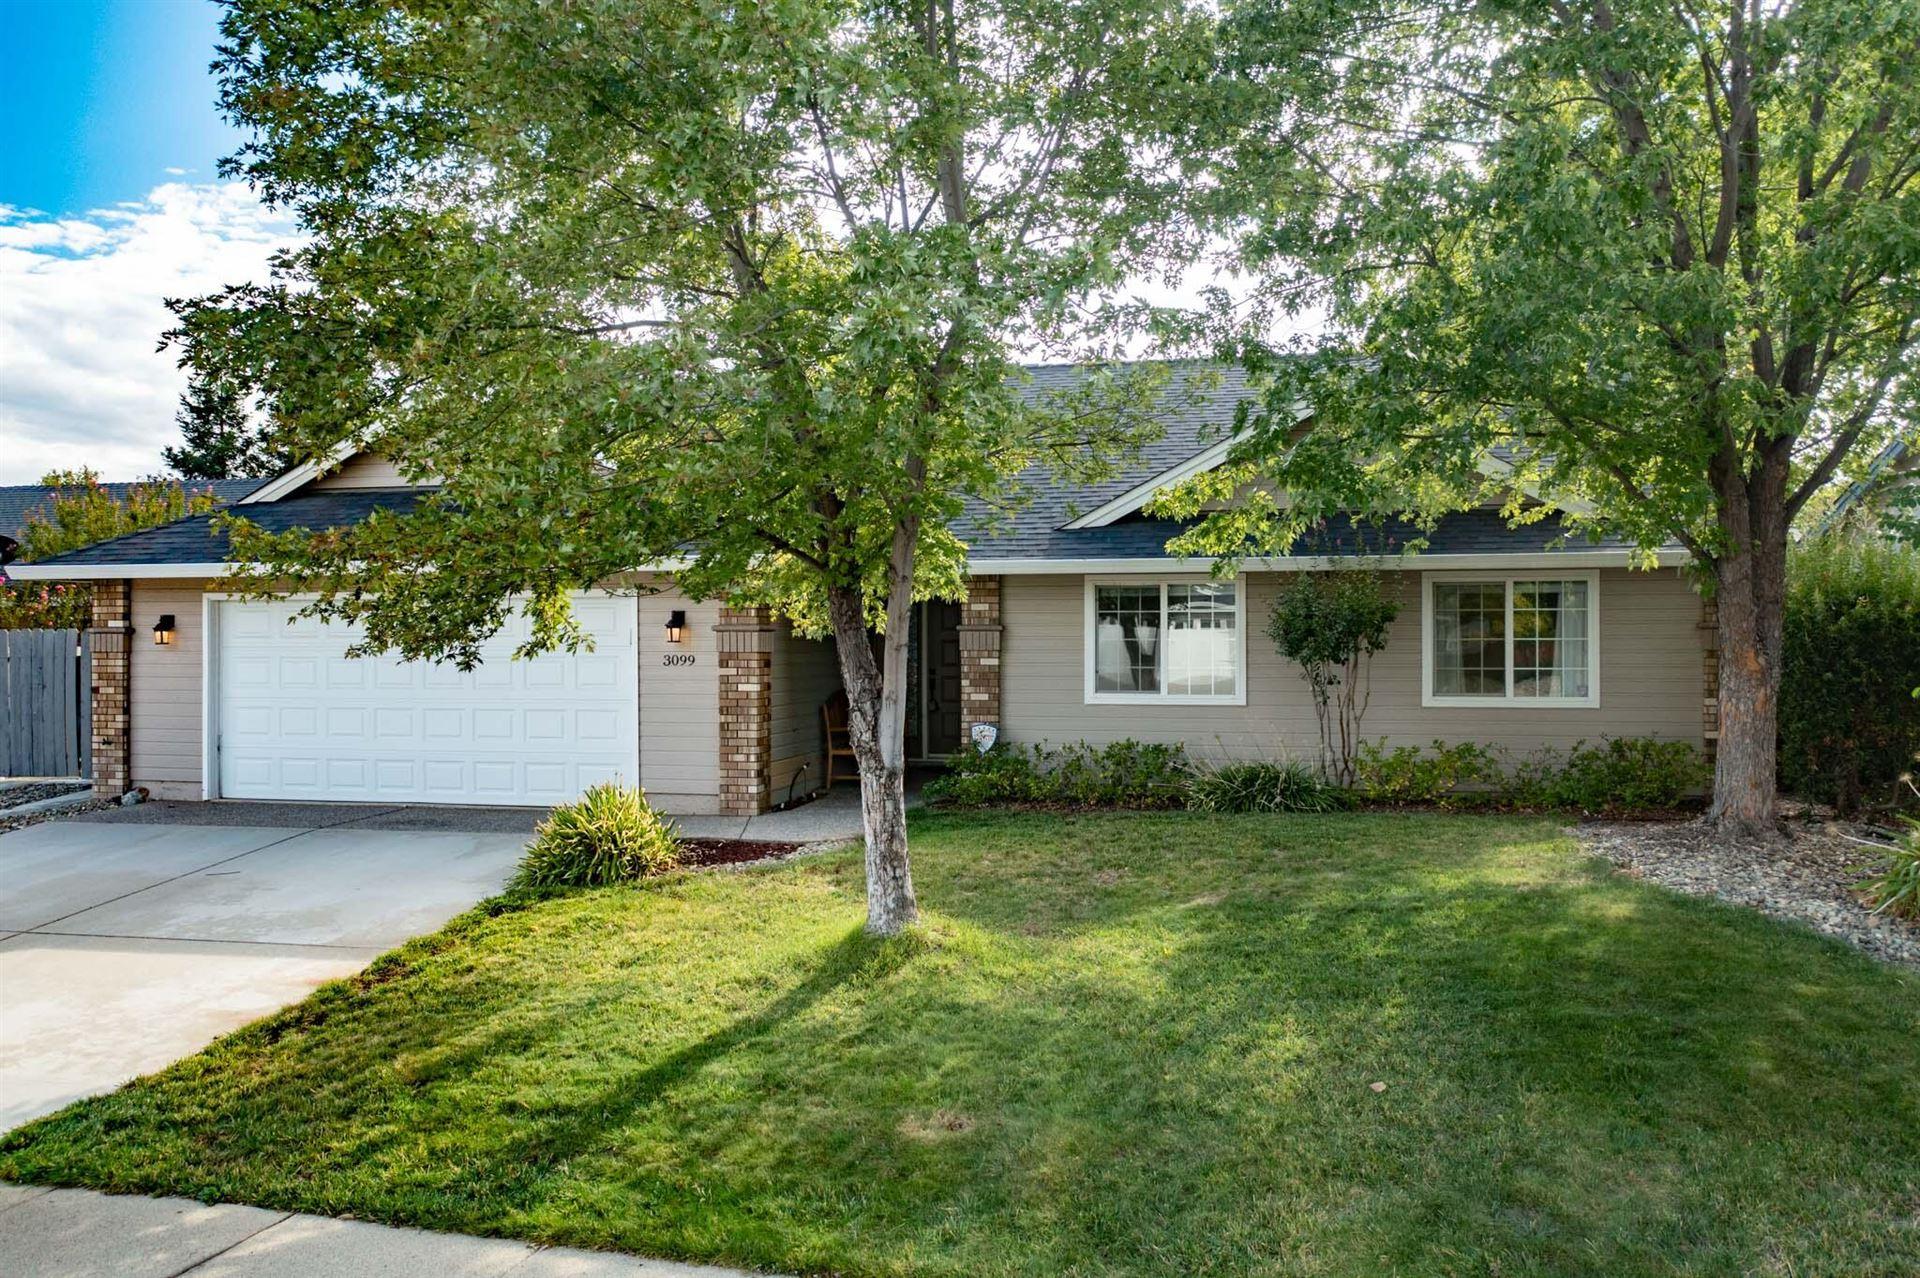 Photo of 3099 Blue Bell Dr, Redding, CA 96001 (MLS # 21-4607)